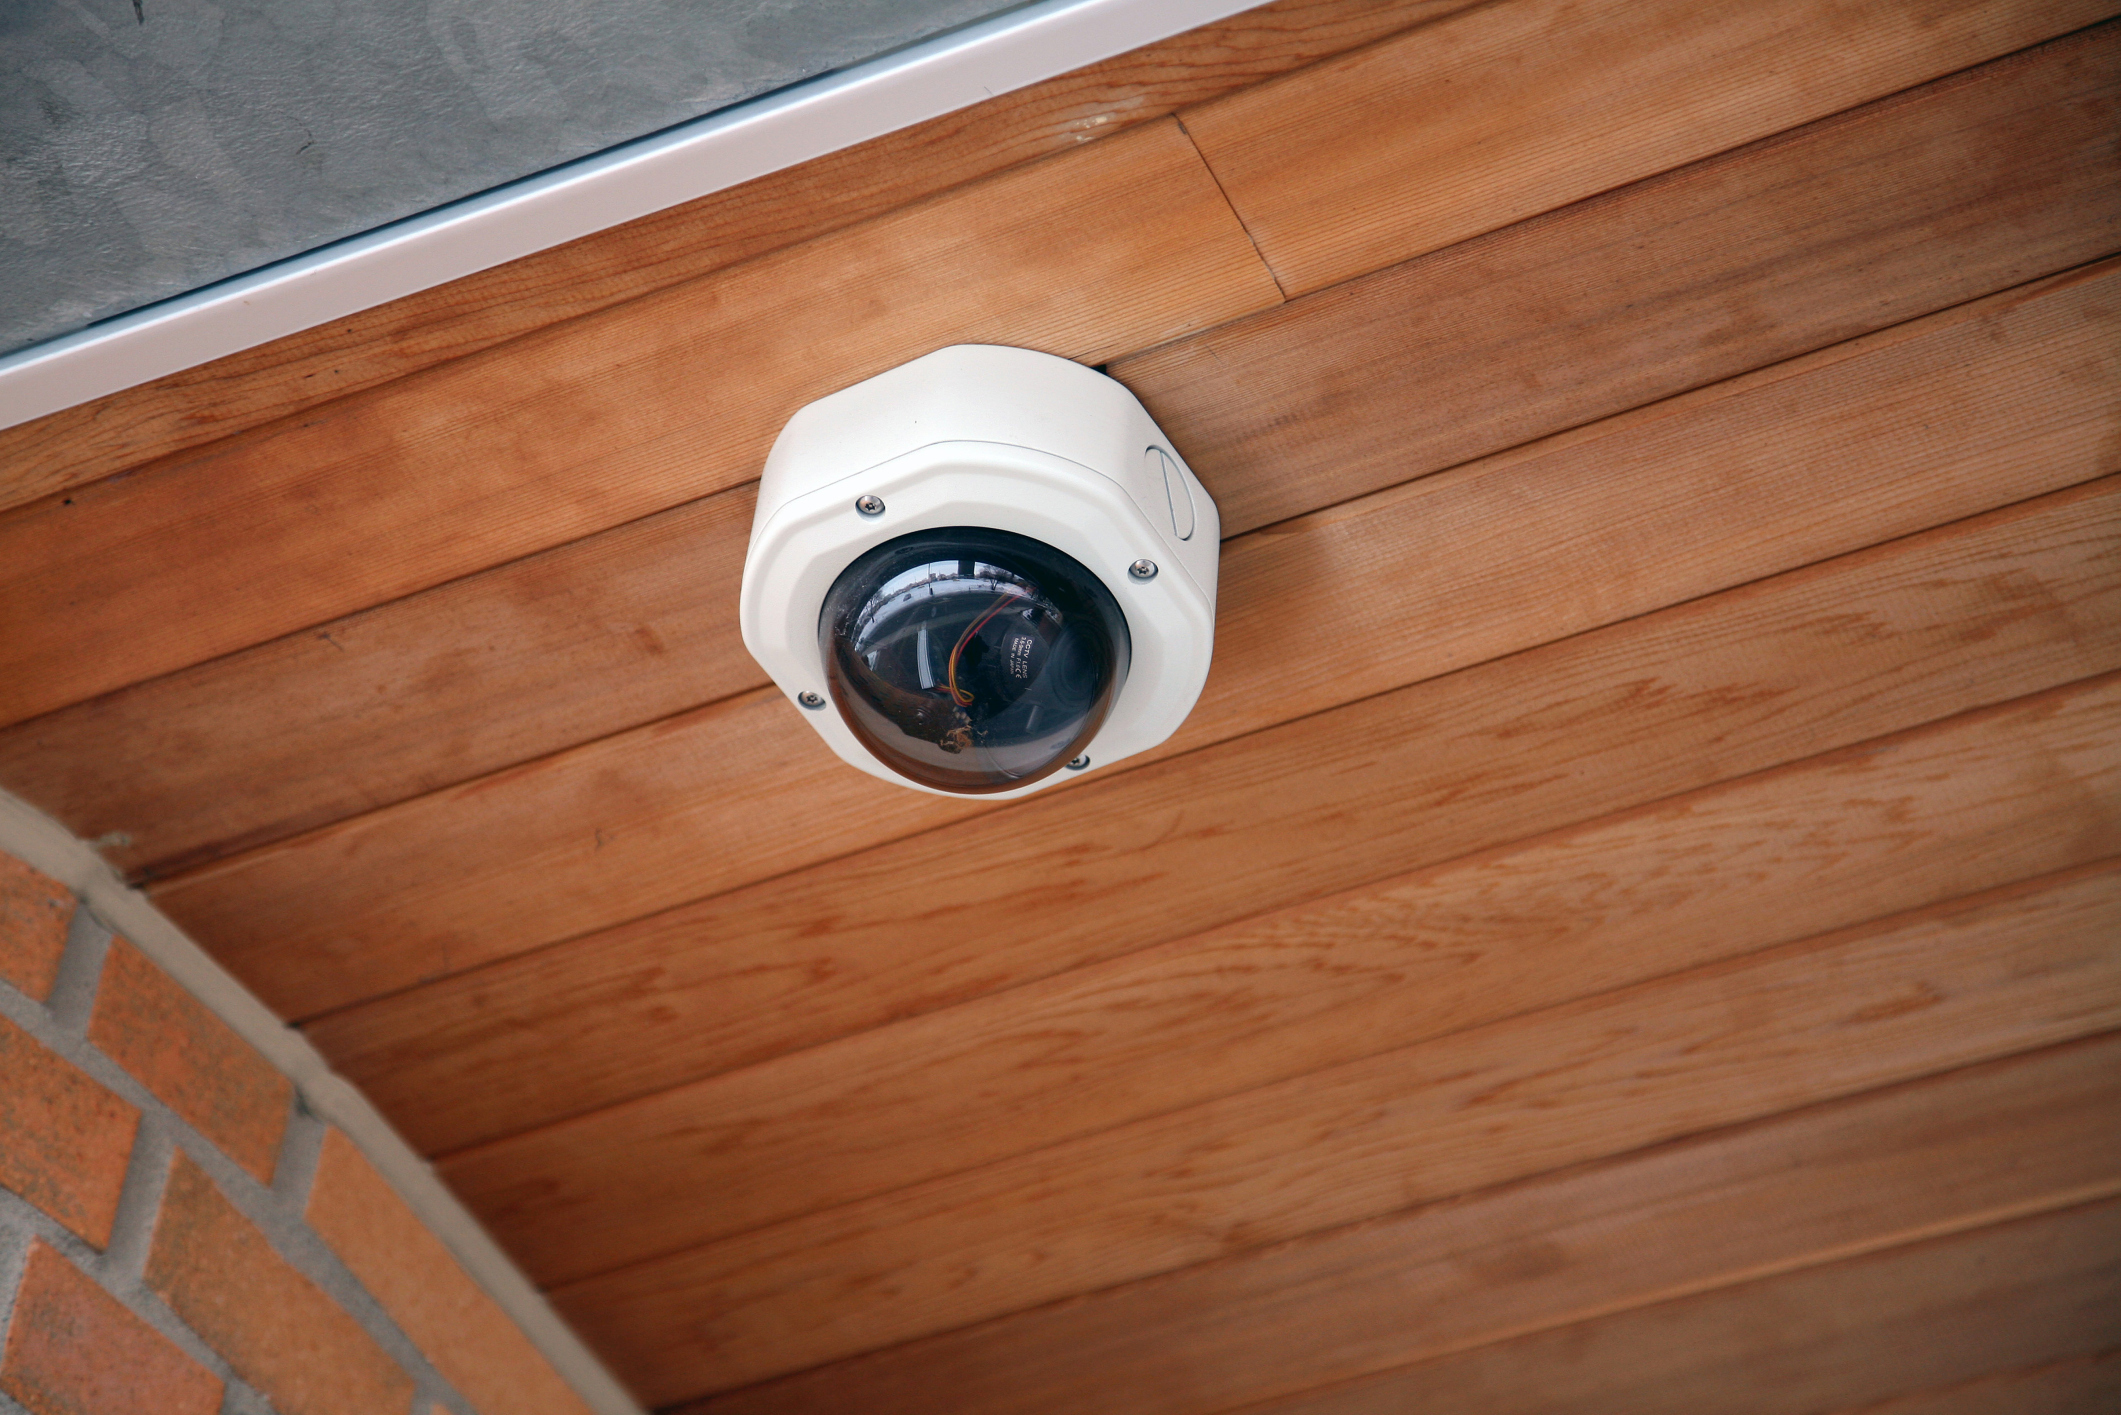 surveillance dome camera on ceiling.jpg